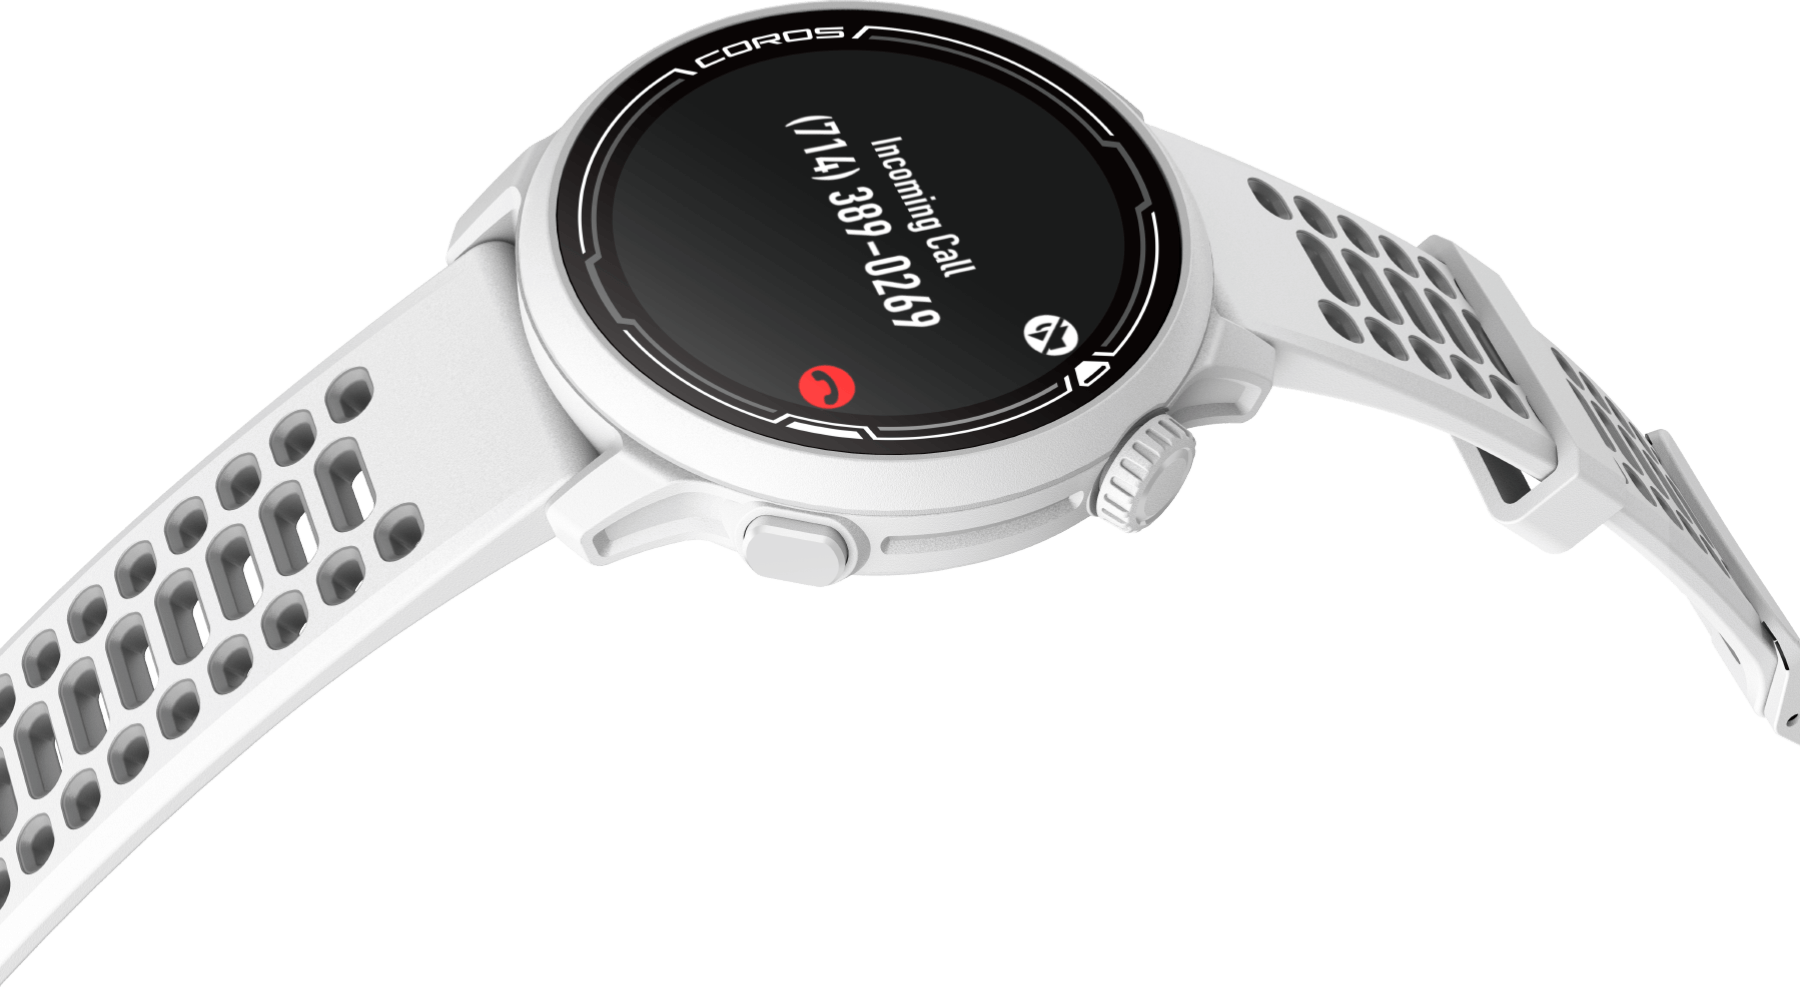 Montre GPS Coros Pace 2 - Test & Avis - Mon GPS Avis.fr